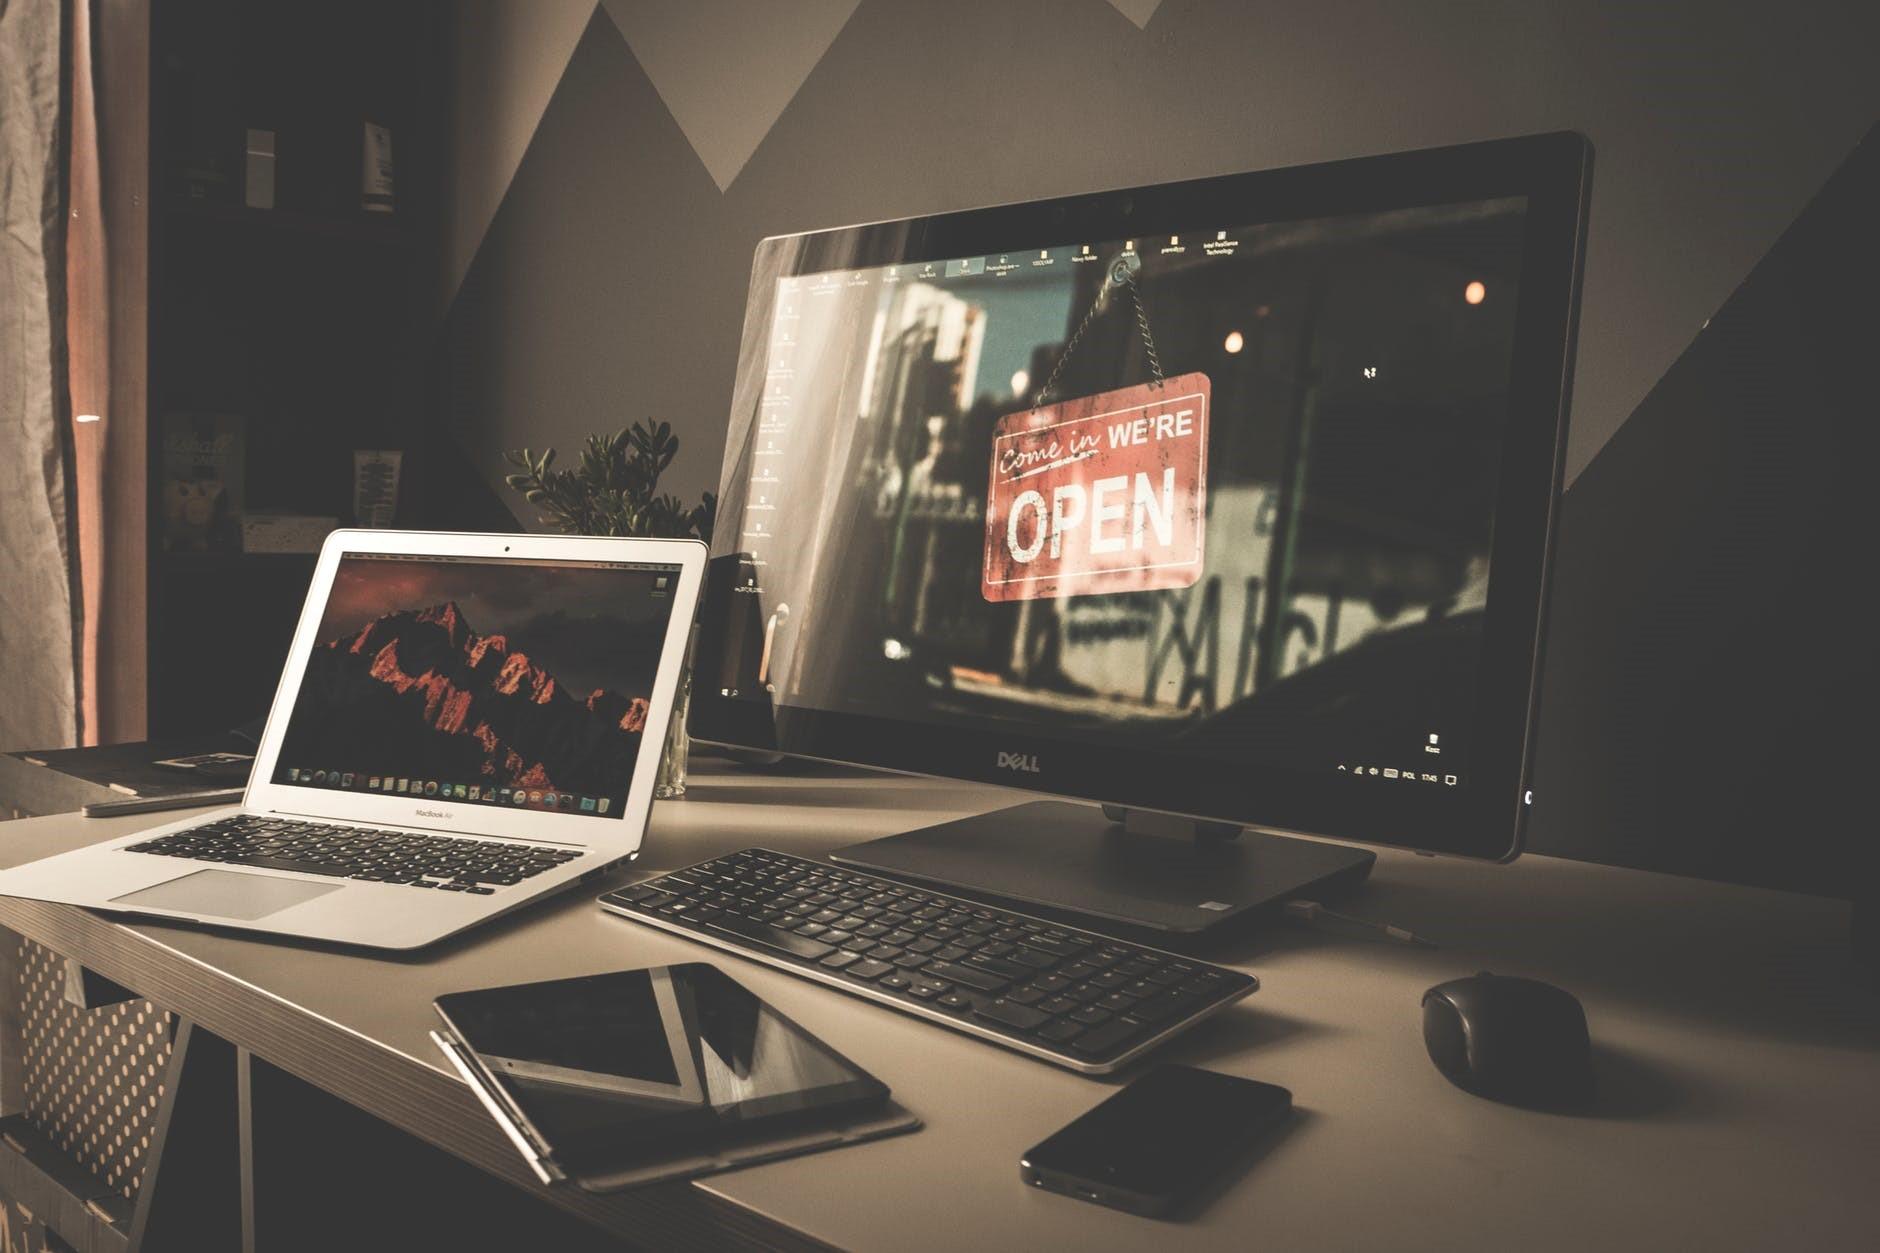 3. Laptops and PCs